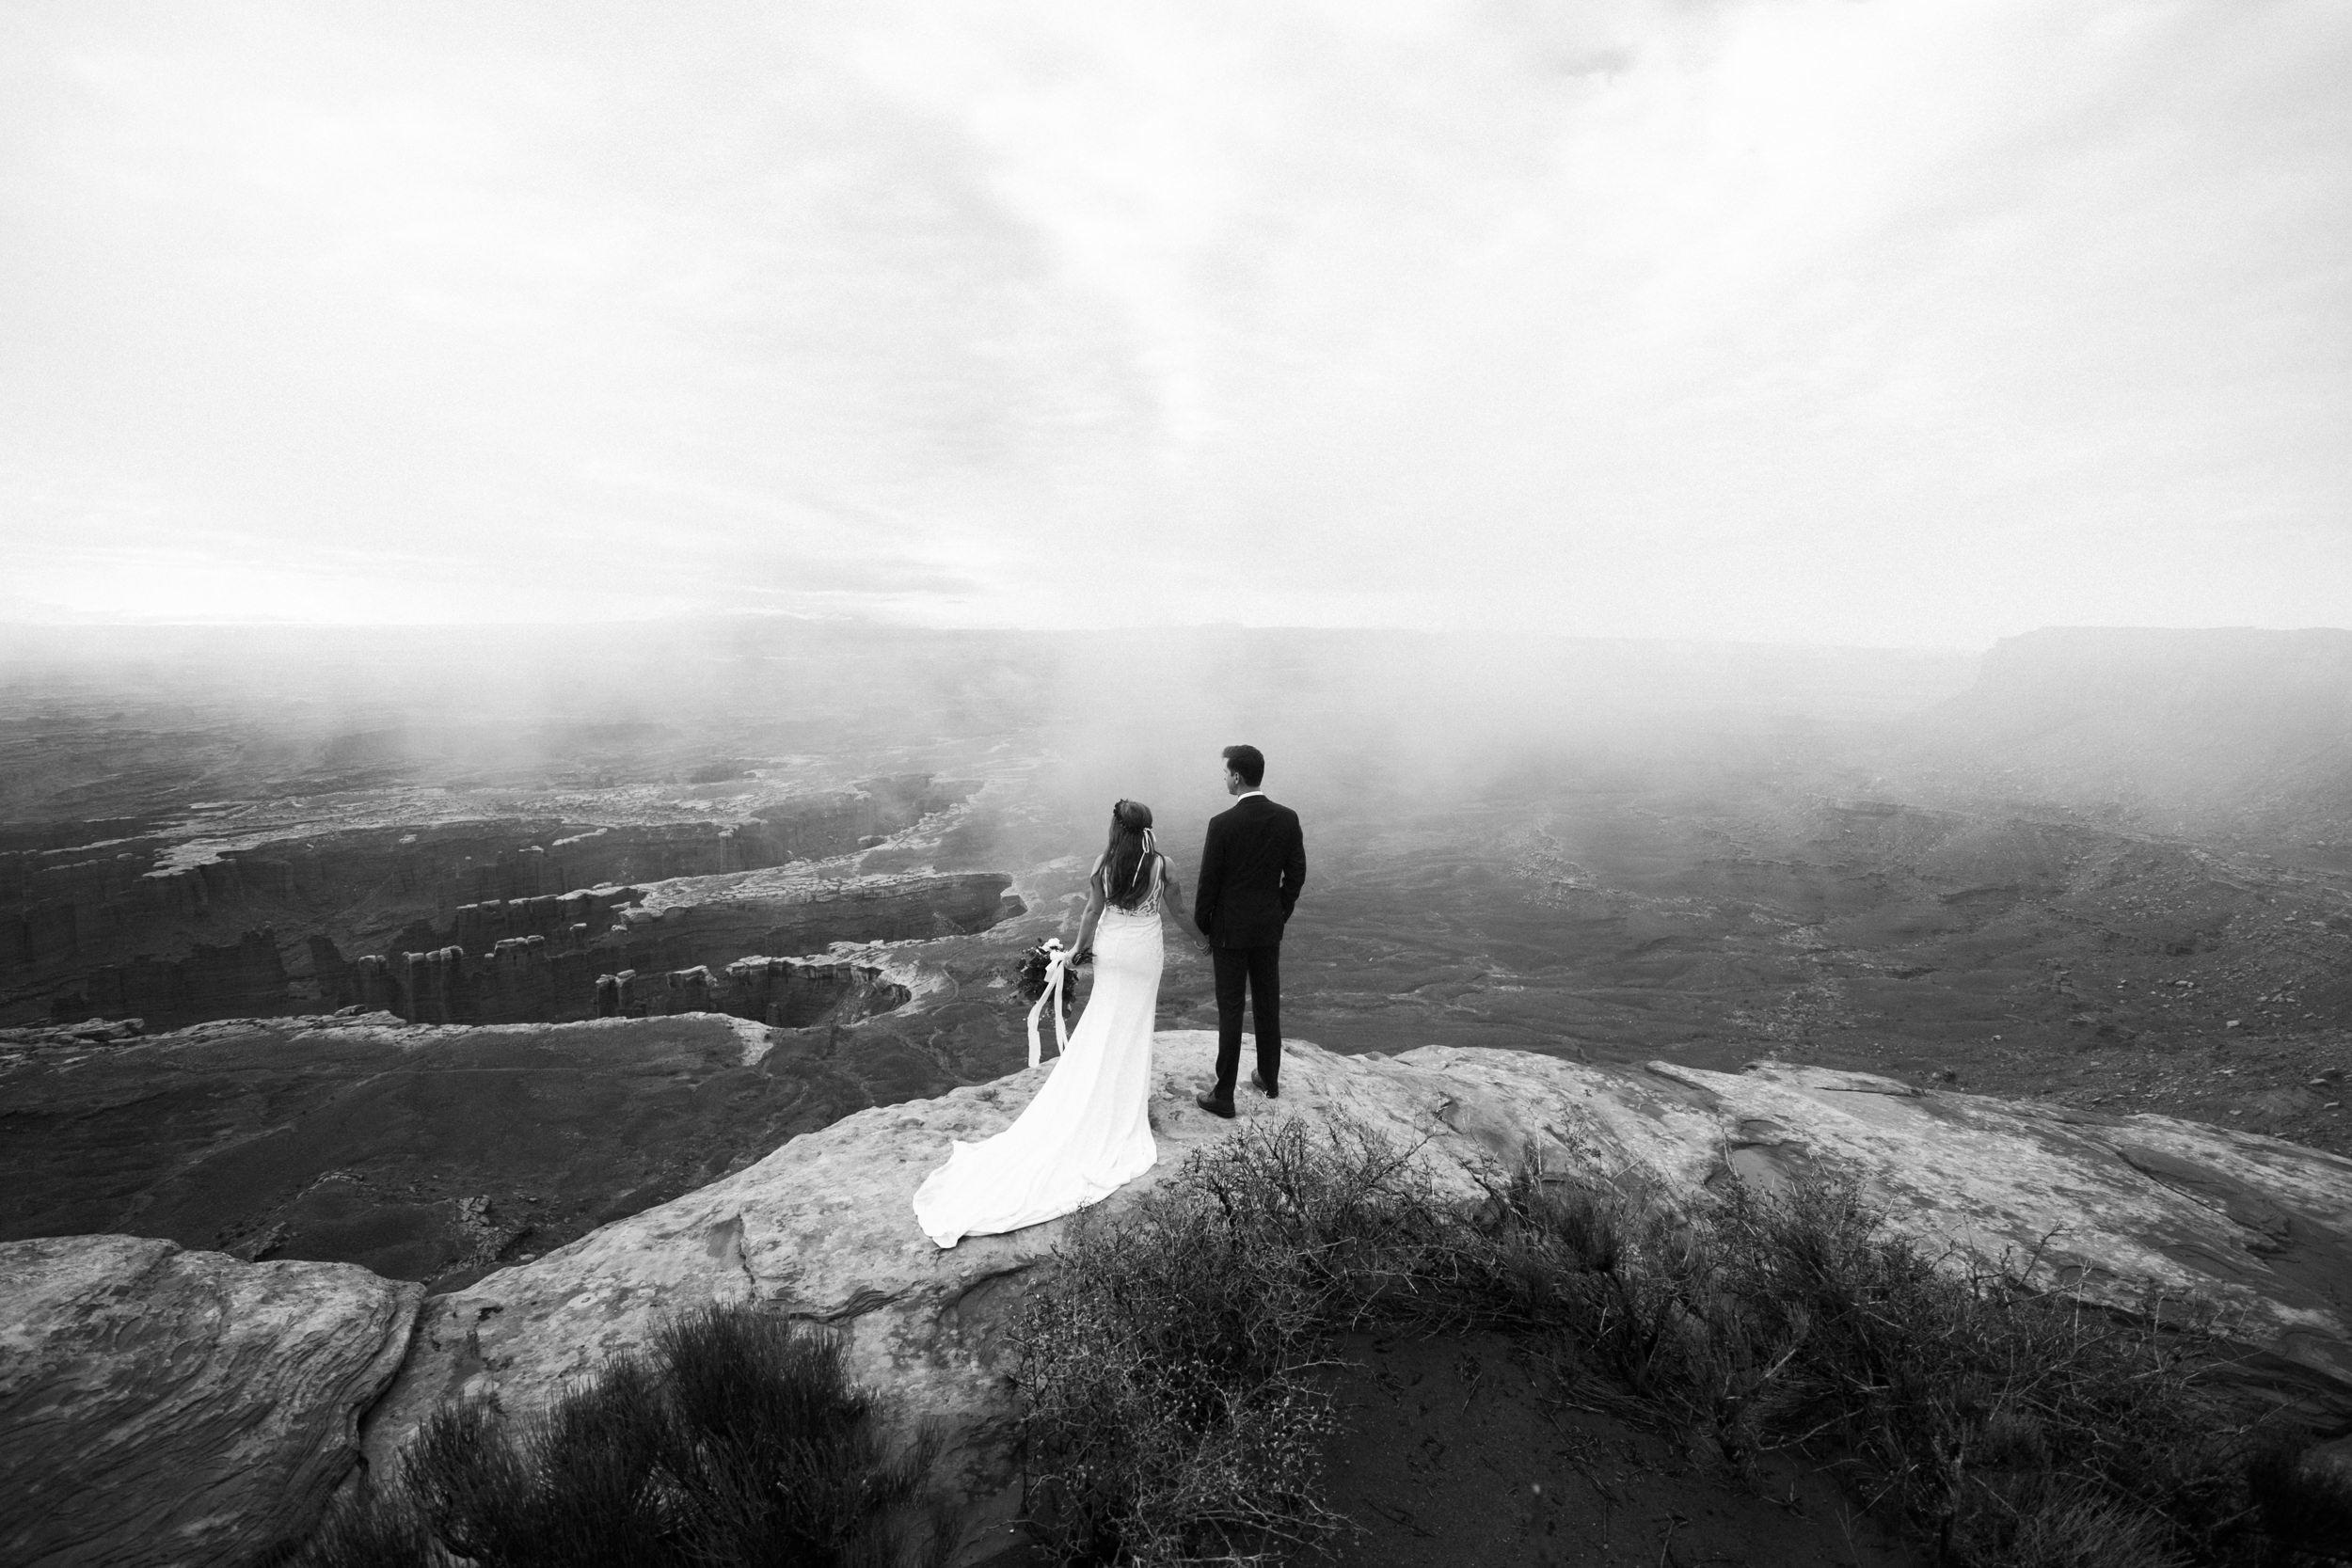 cliffside elopement in the desert Intimate weddings